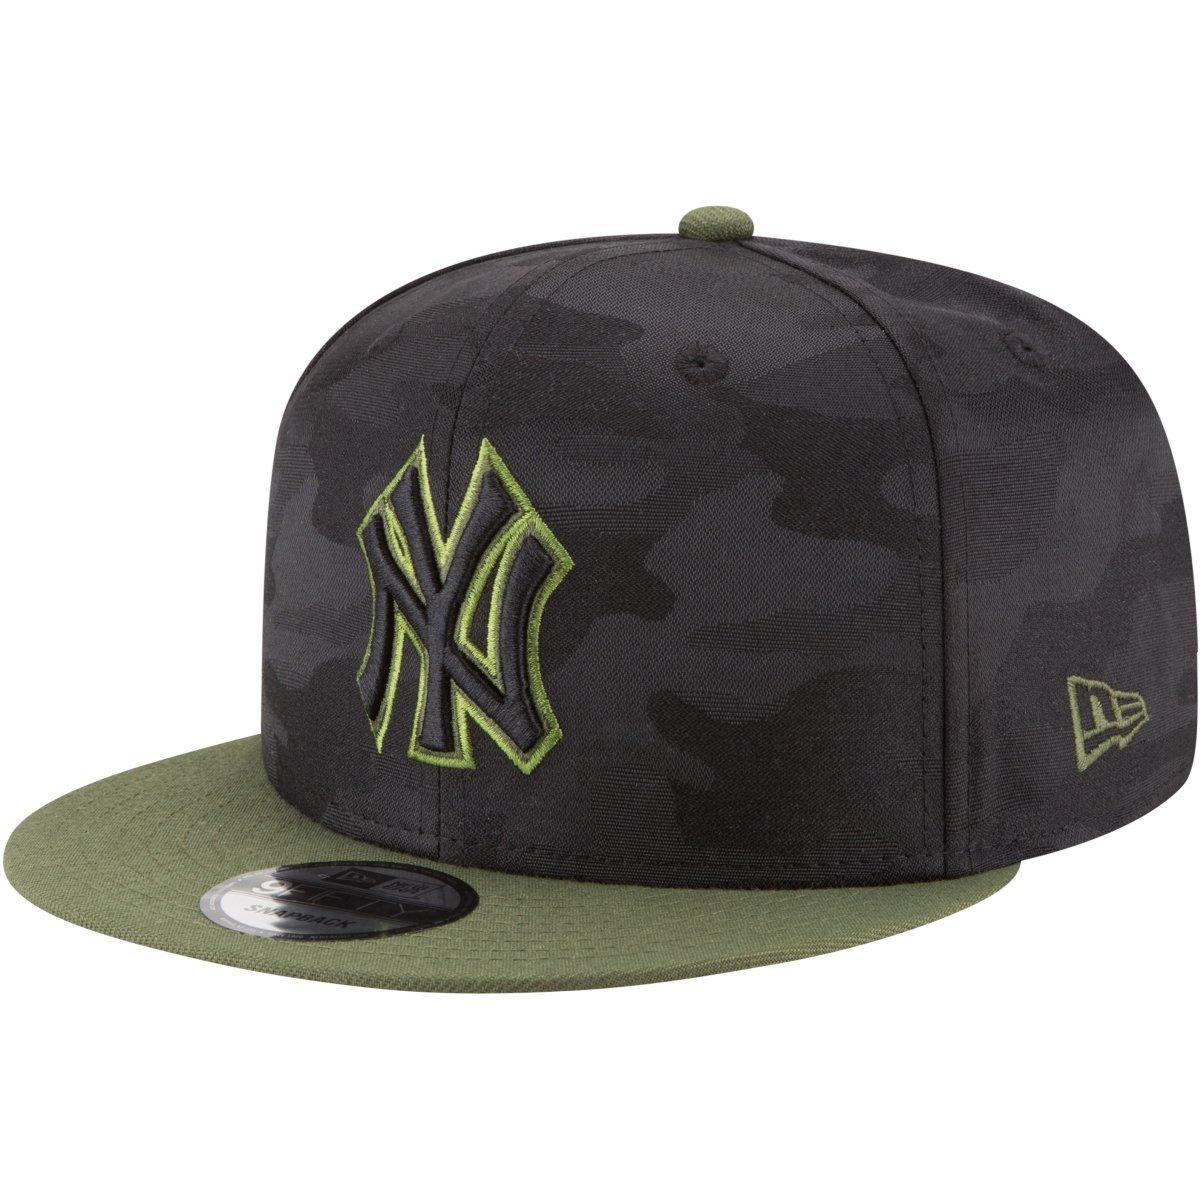 Amazon.com  New Era New York Yankees Memorial Day Snapback Cap 9fifty 950  OSFM Basecap Limited Special Edition  Clothing e8135251298